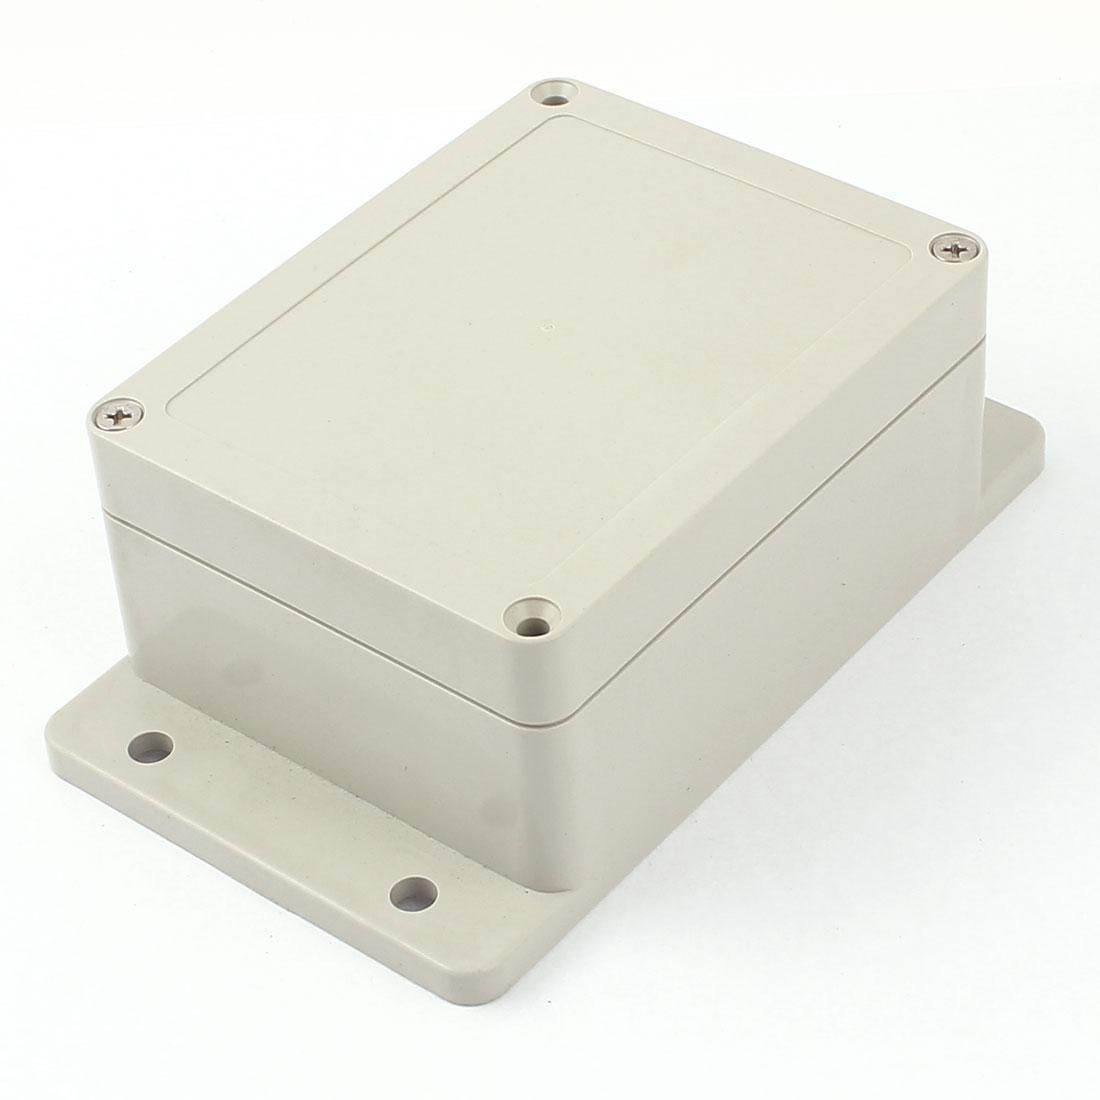 115 x 90 x 55mm Dustproof IP65 Plastic Enclosure Case Power Junction Box